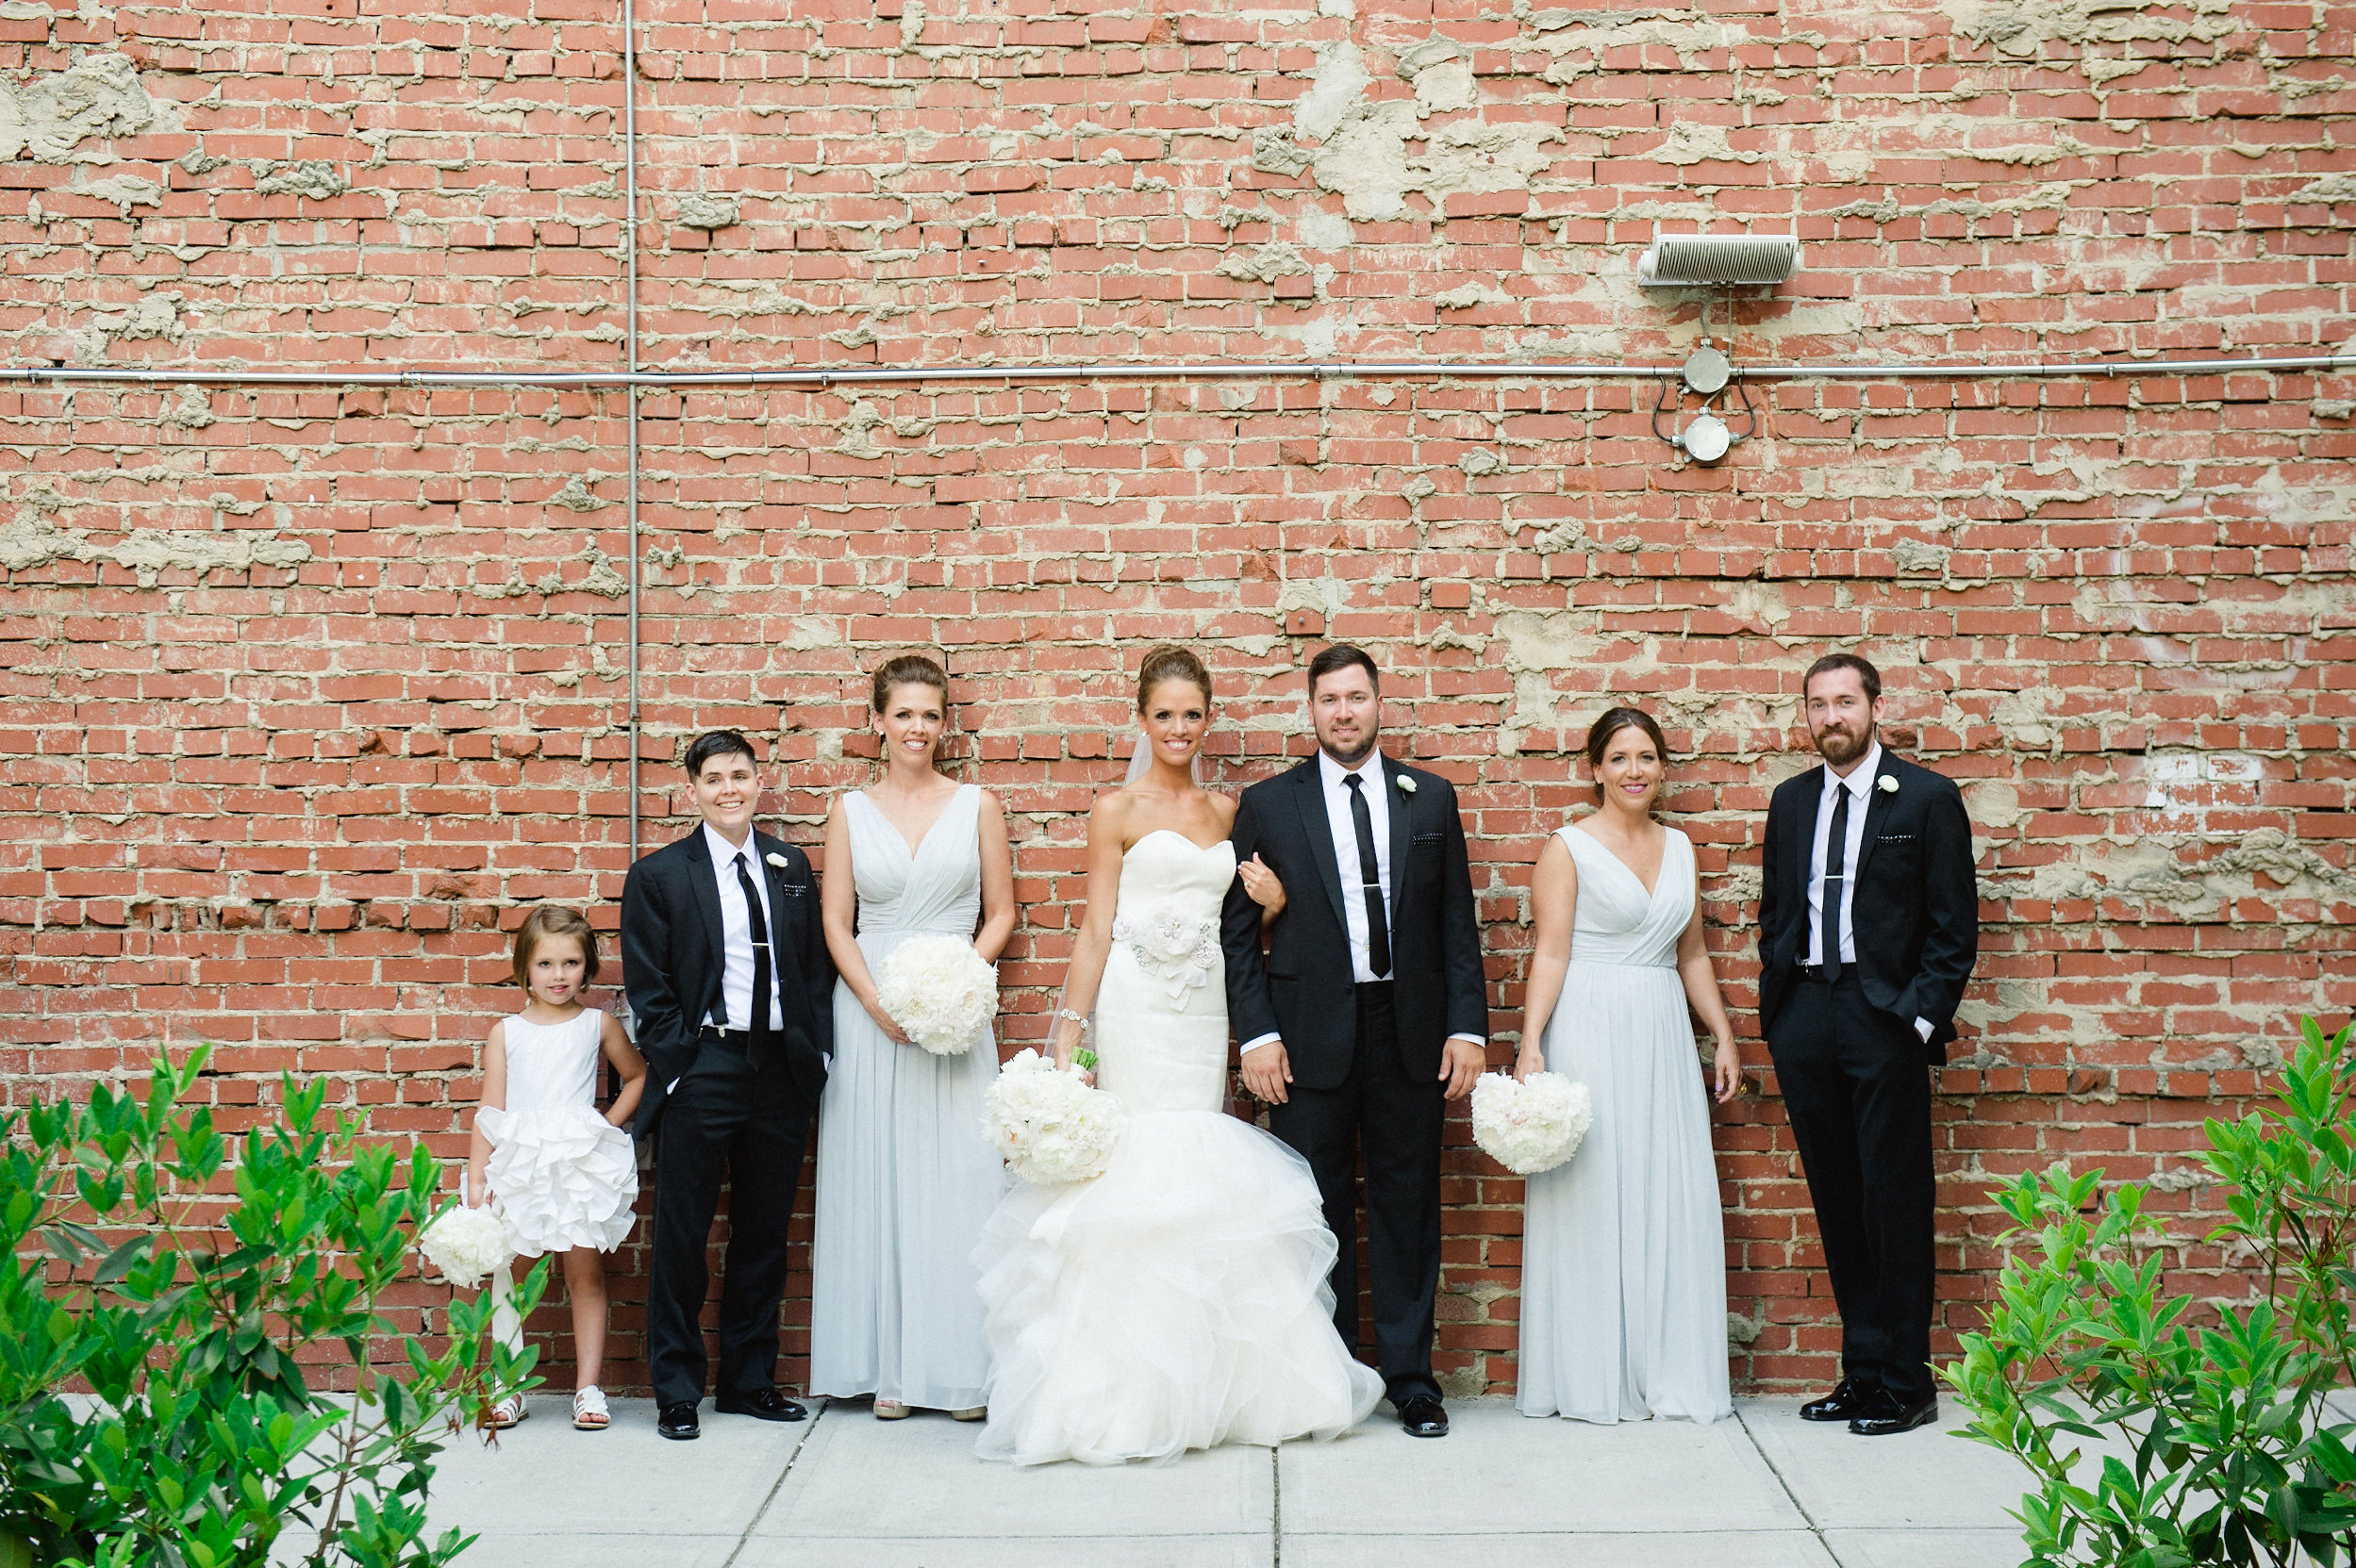 shelby&jordan|smitten&hooked|wedding|groups-079.jpg